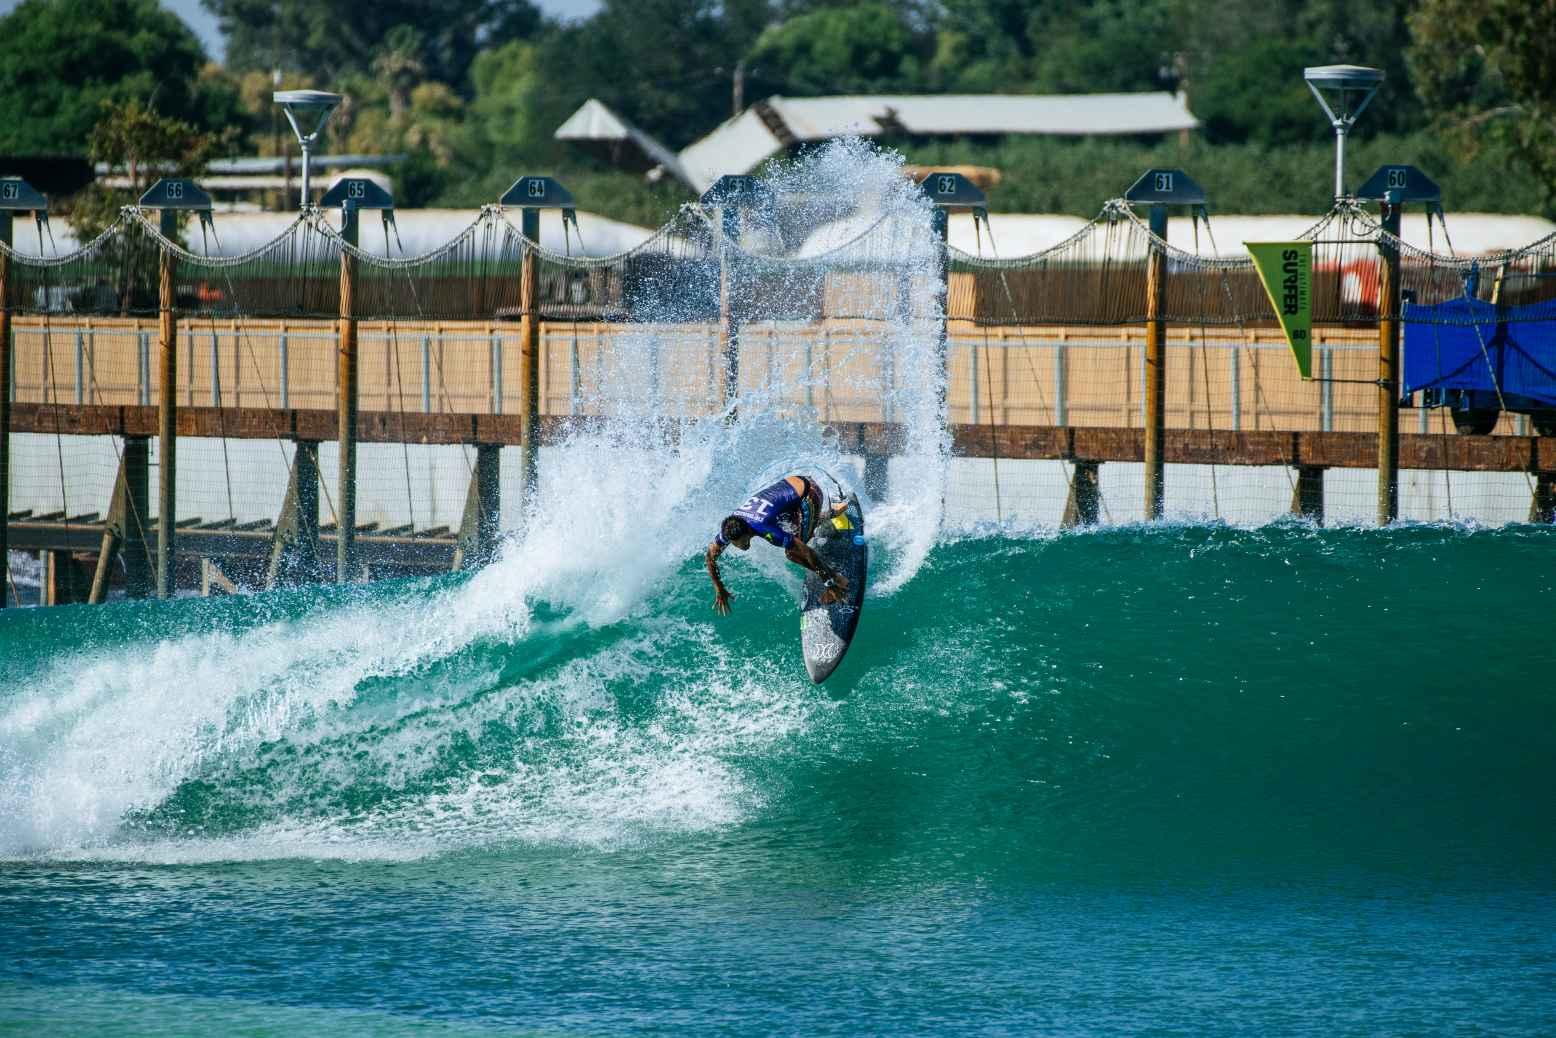 surf30 surf ranch pro 2021 wsl surf Toledo F Ranch21 PNN 6833